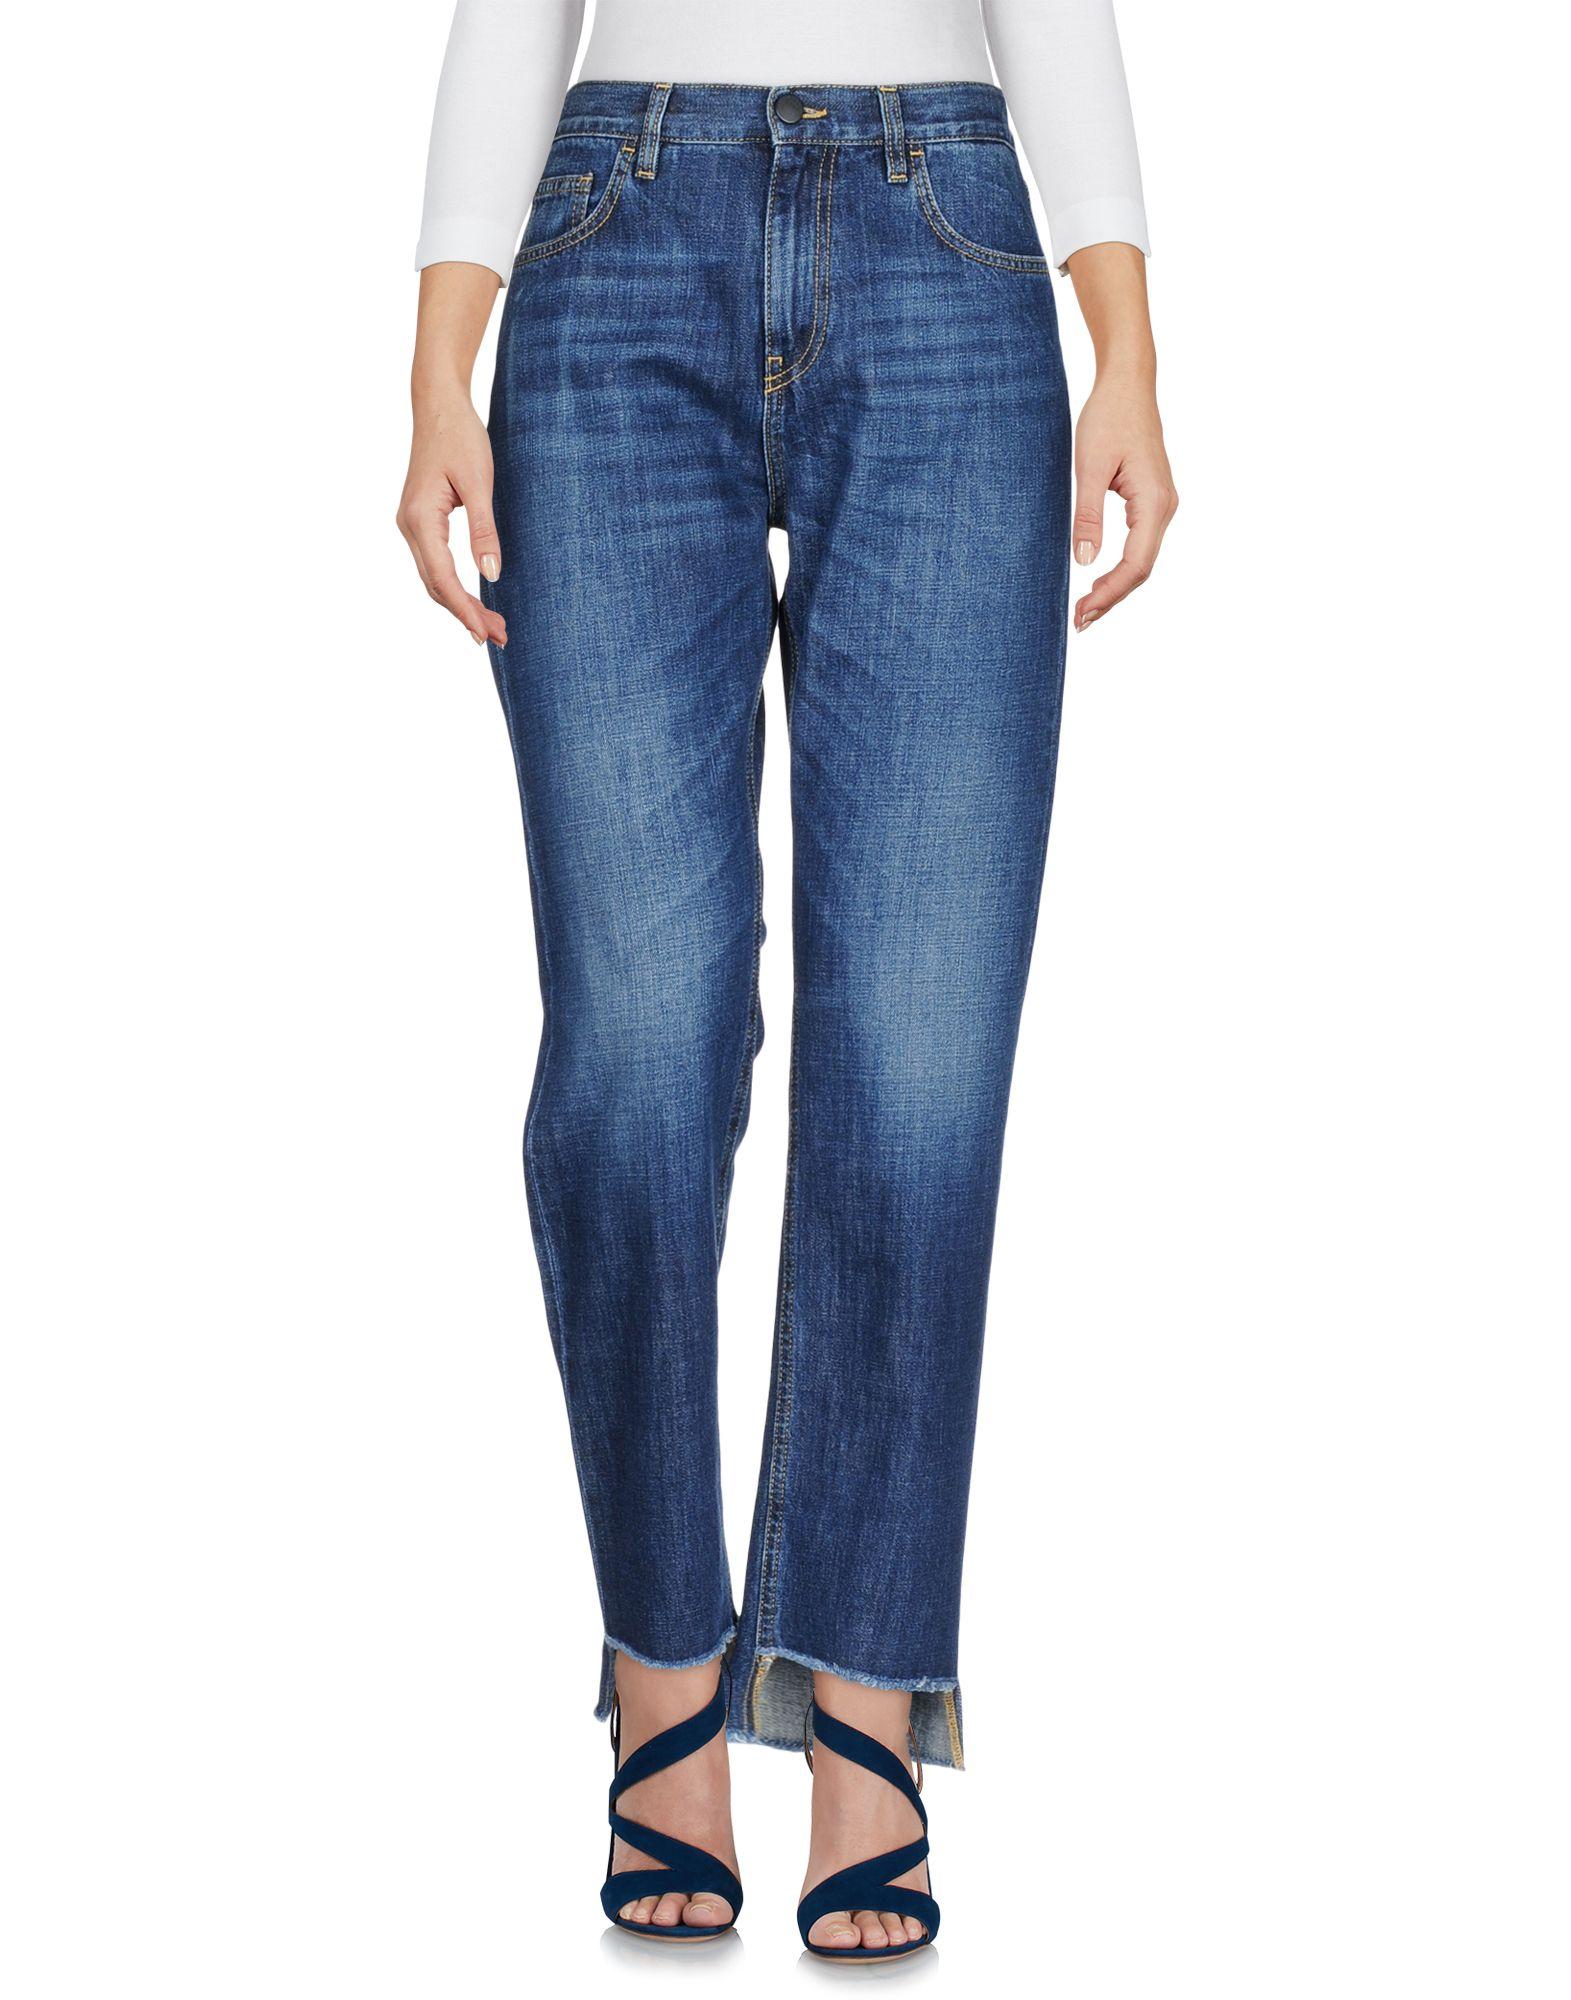 Pantaloni Jeans Jucca Donna - Acquista online su V8RL4md